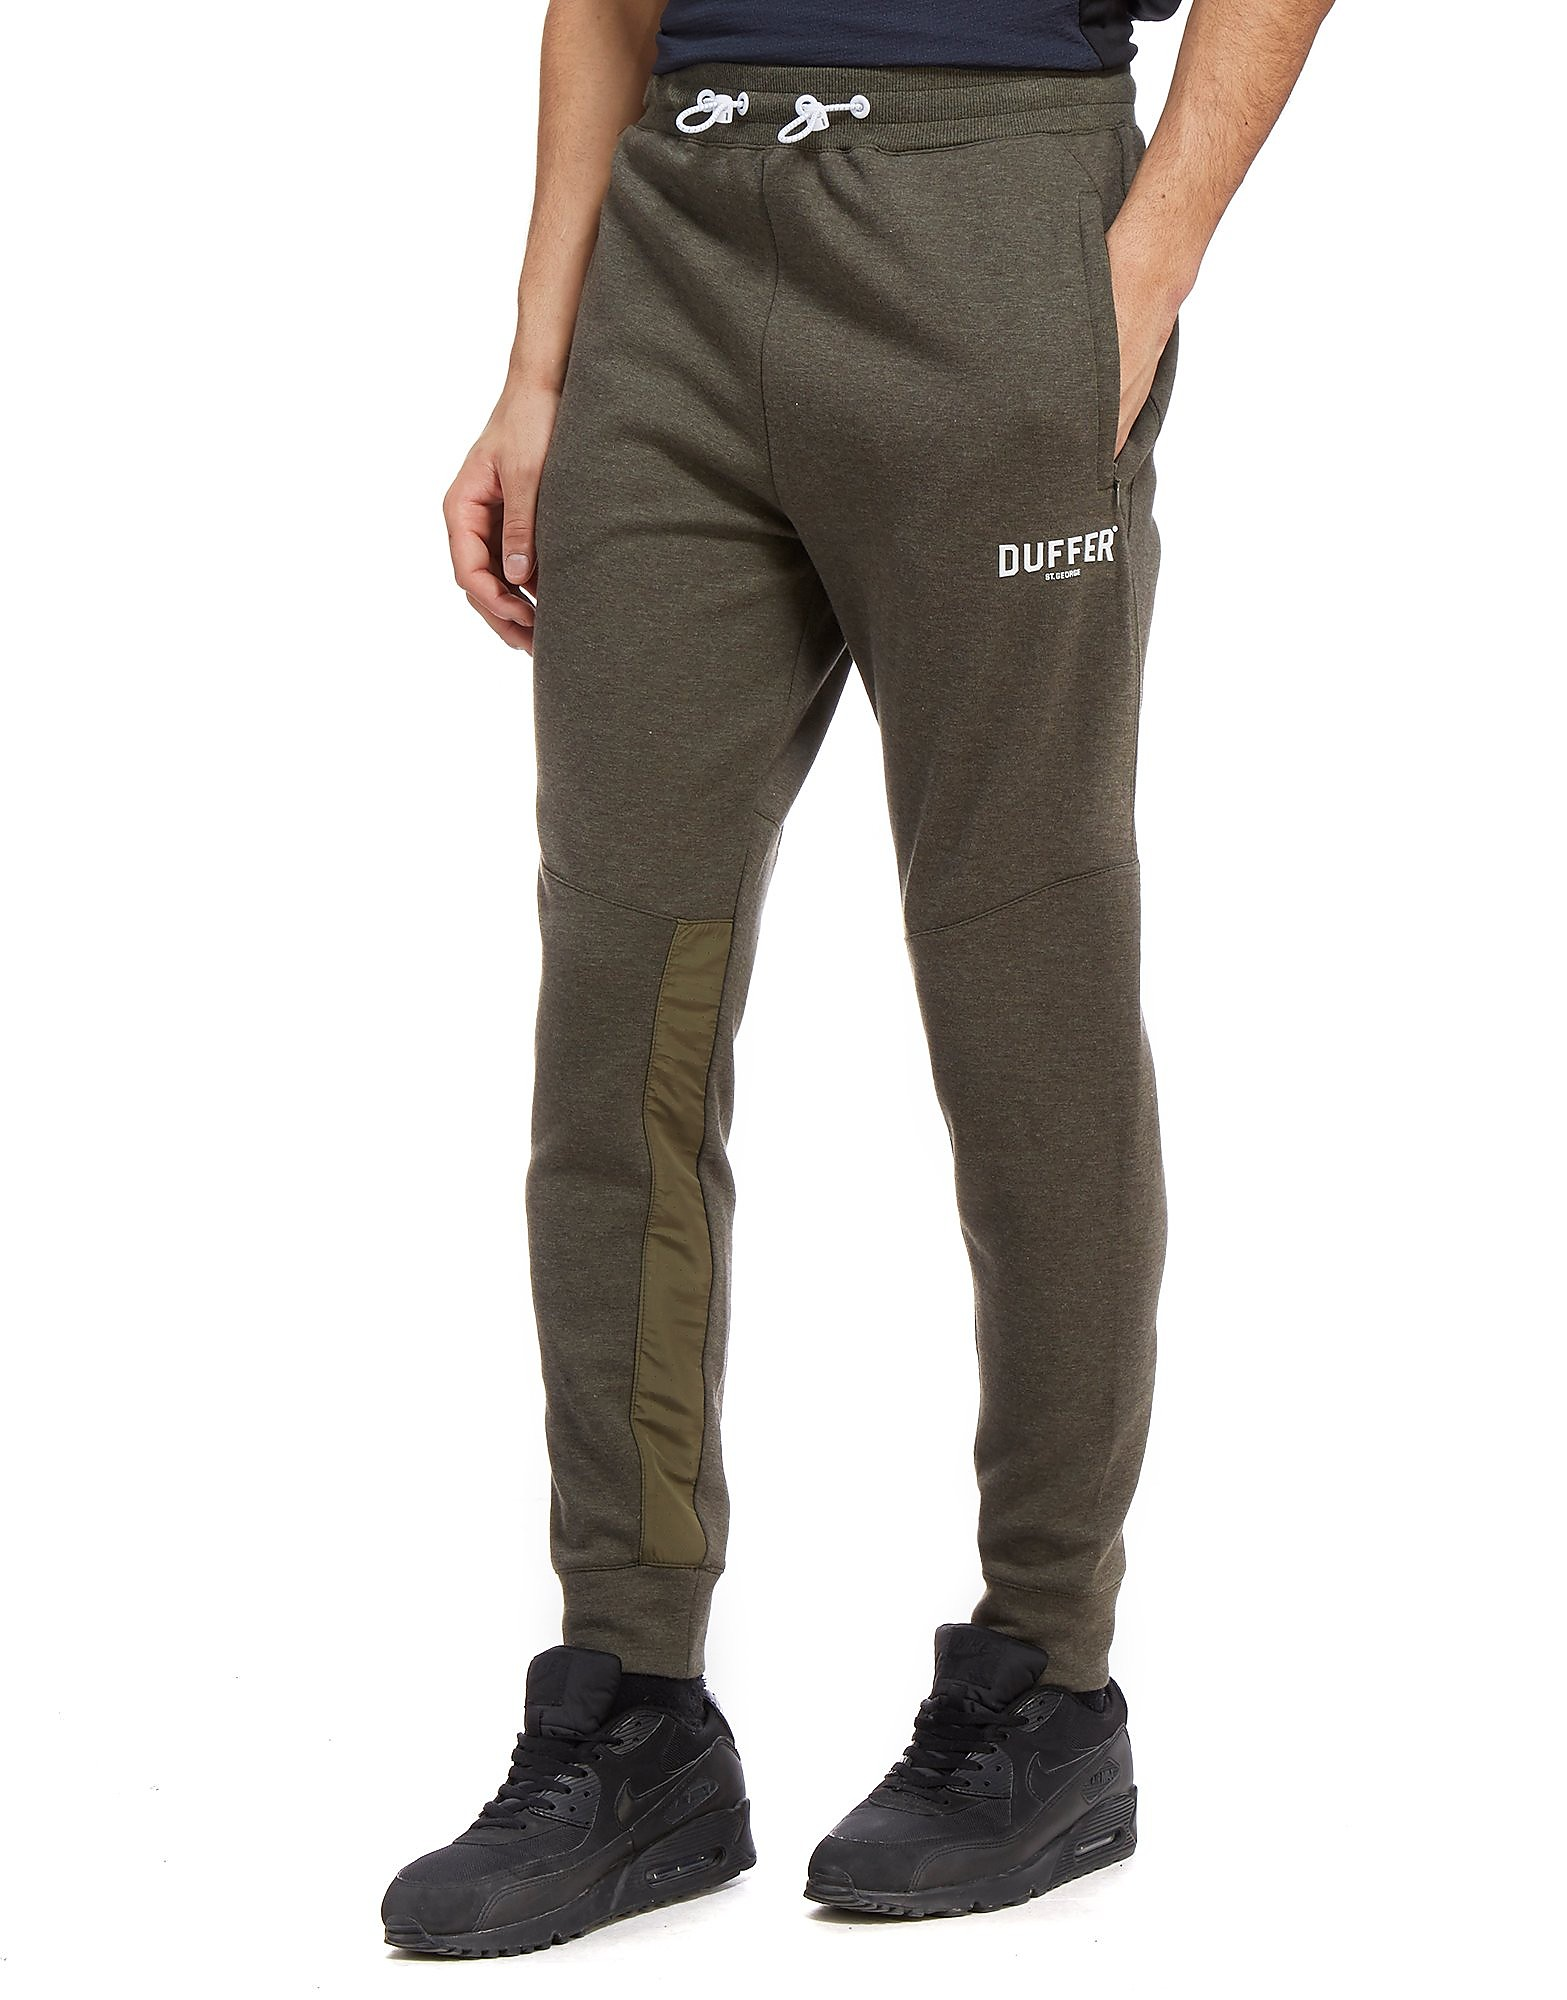 Duffer of St George Resource Jogging Pants